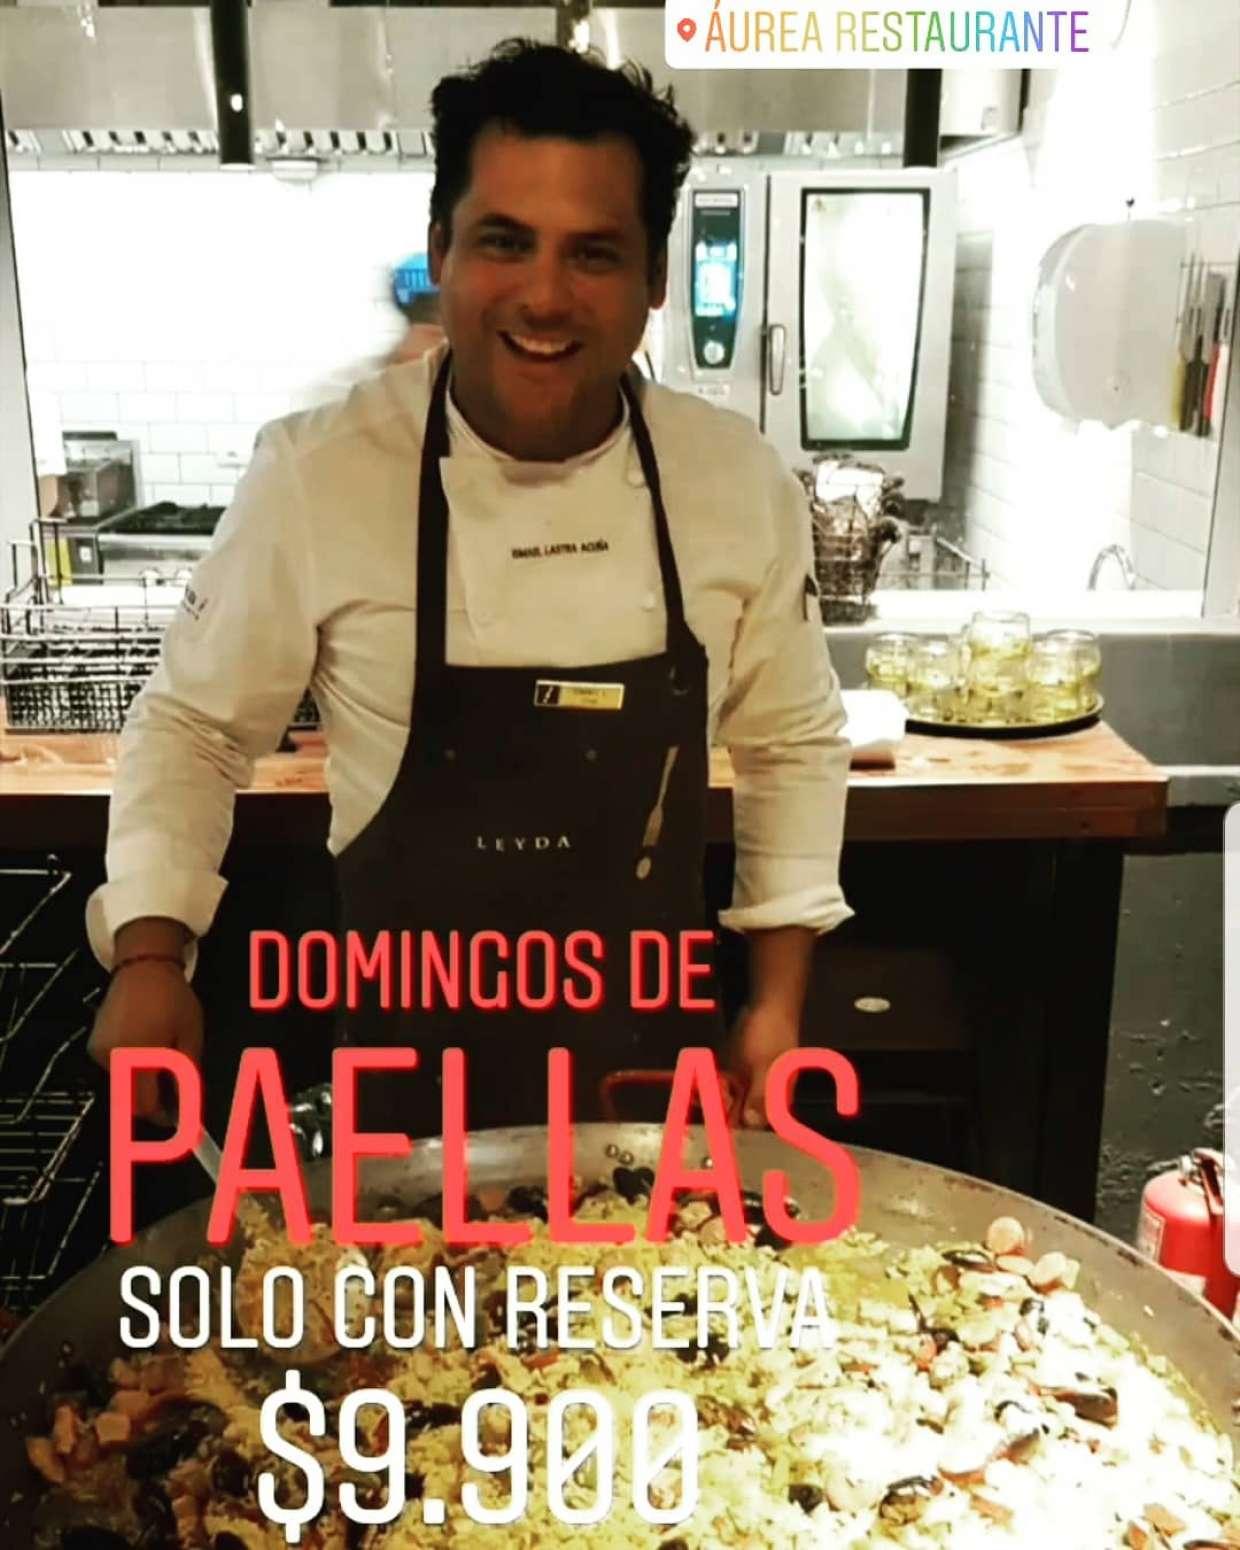 Domingo de Paellas